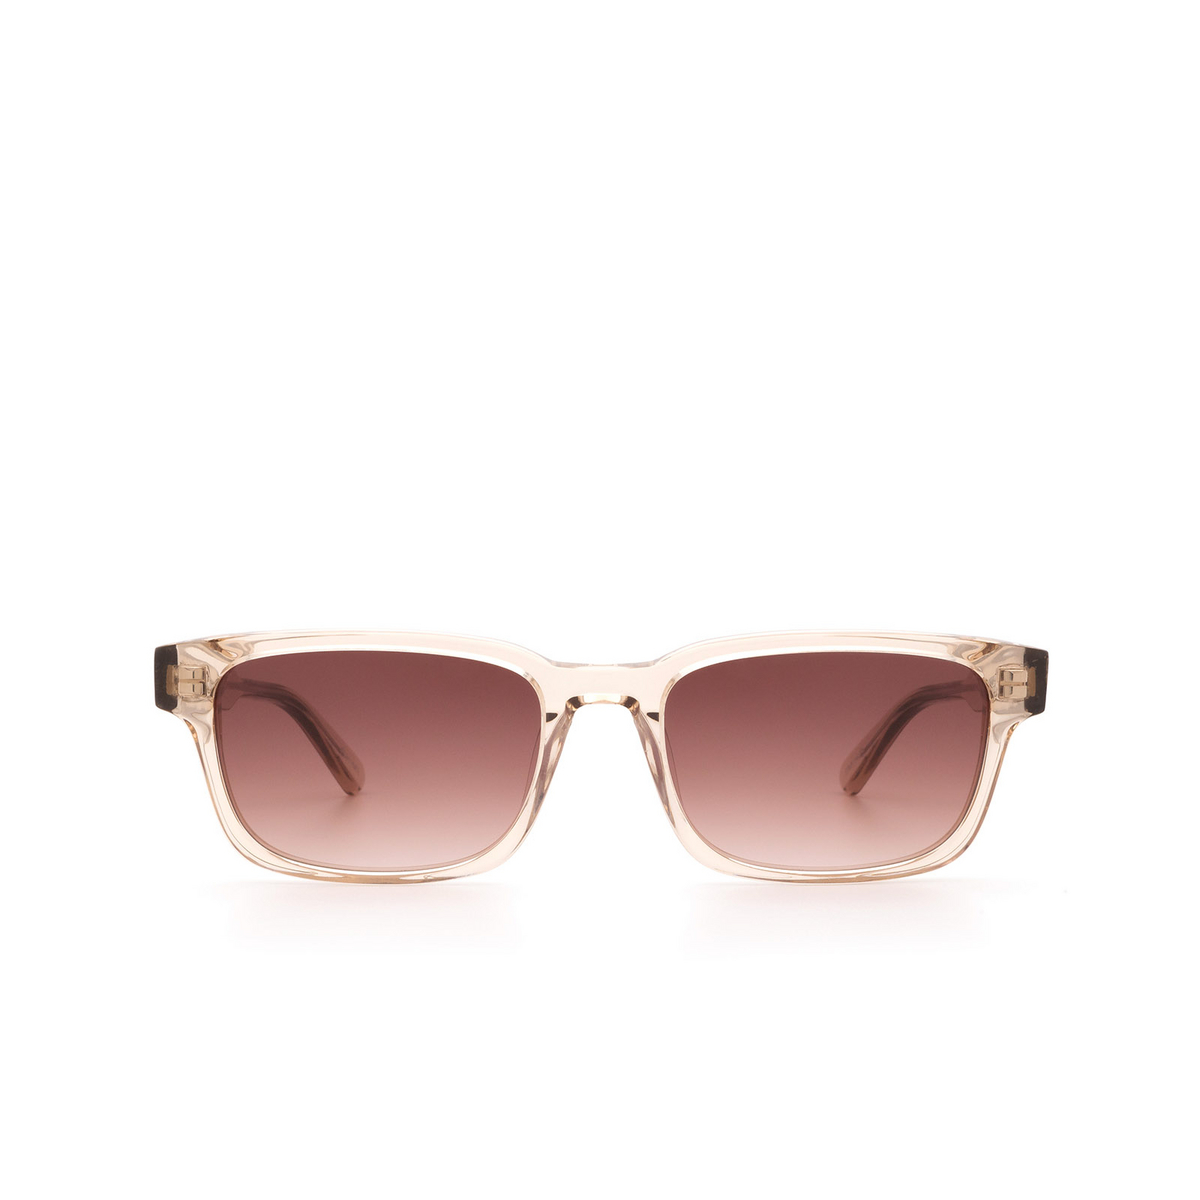 Chimi® Rectangle Sunglasses: #106 color Light Beige Ecru - front view.